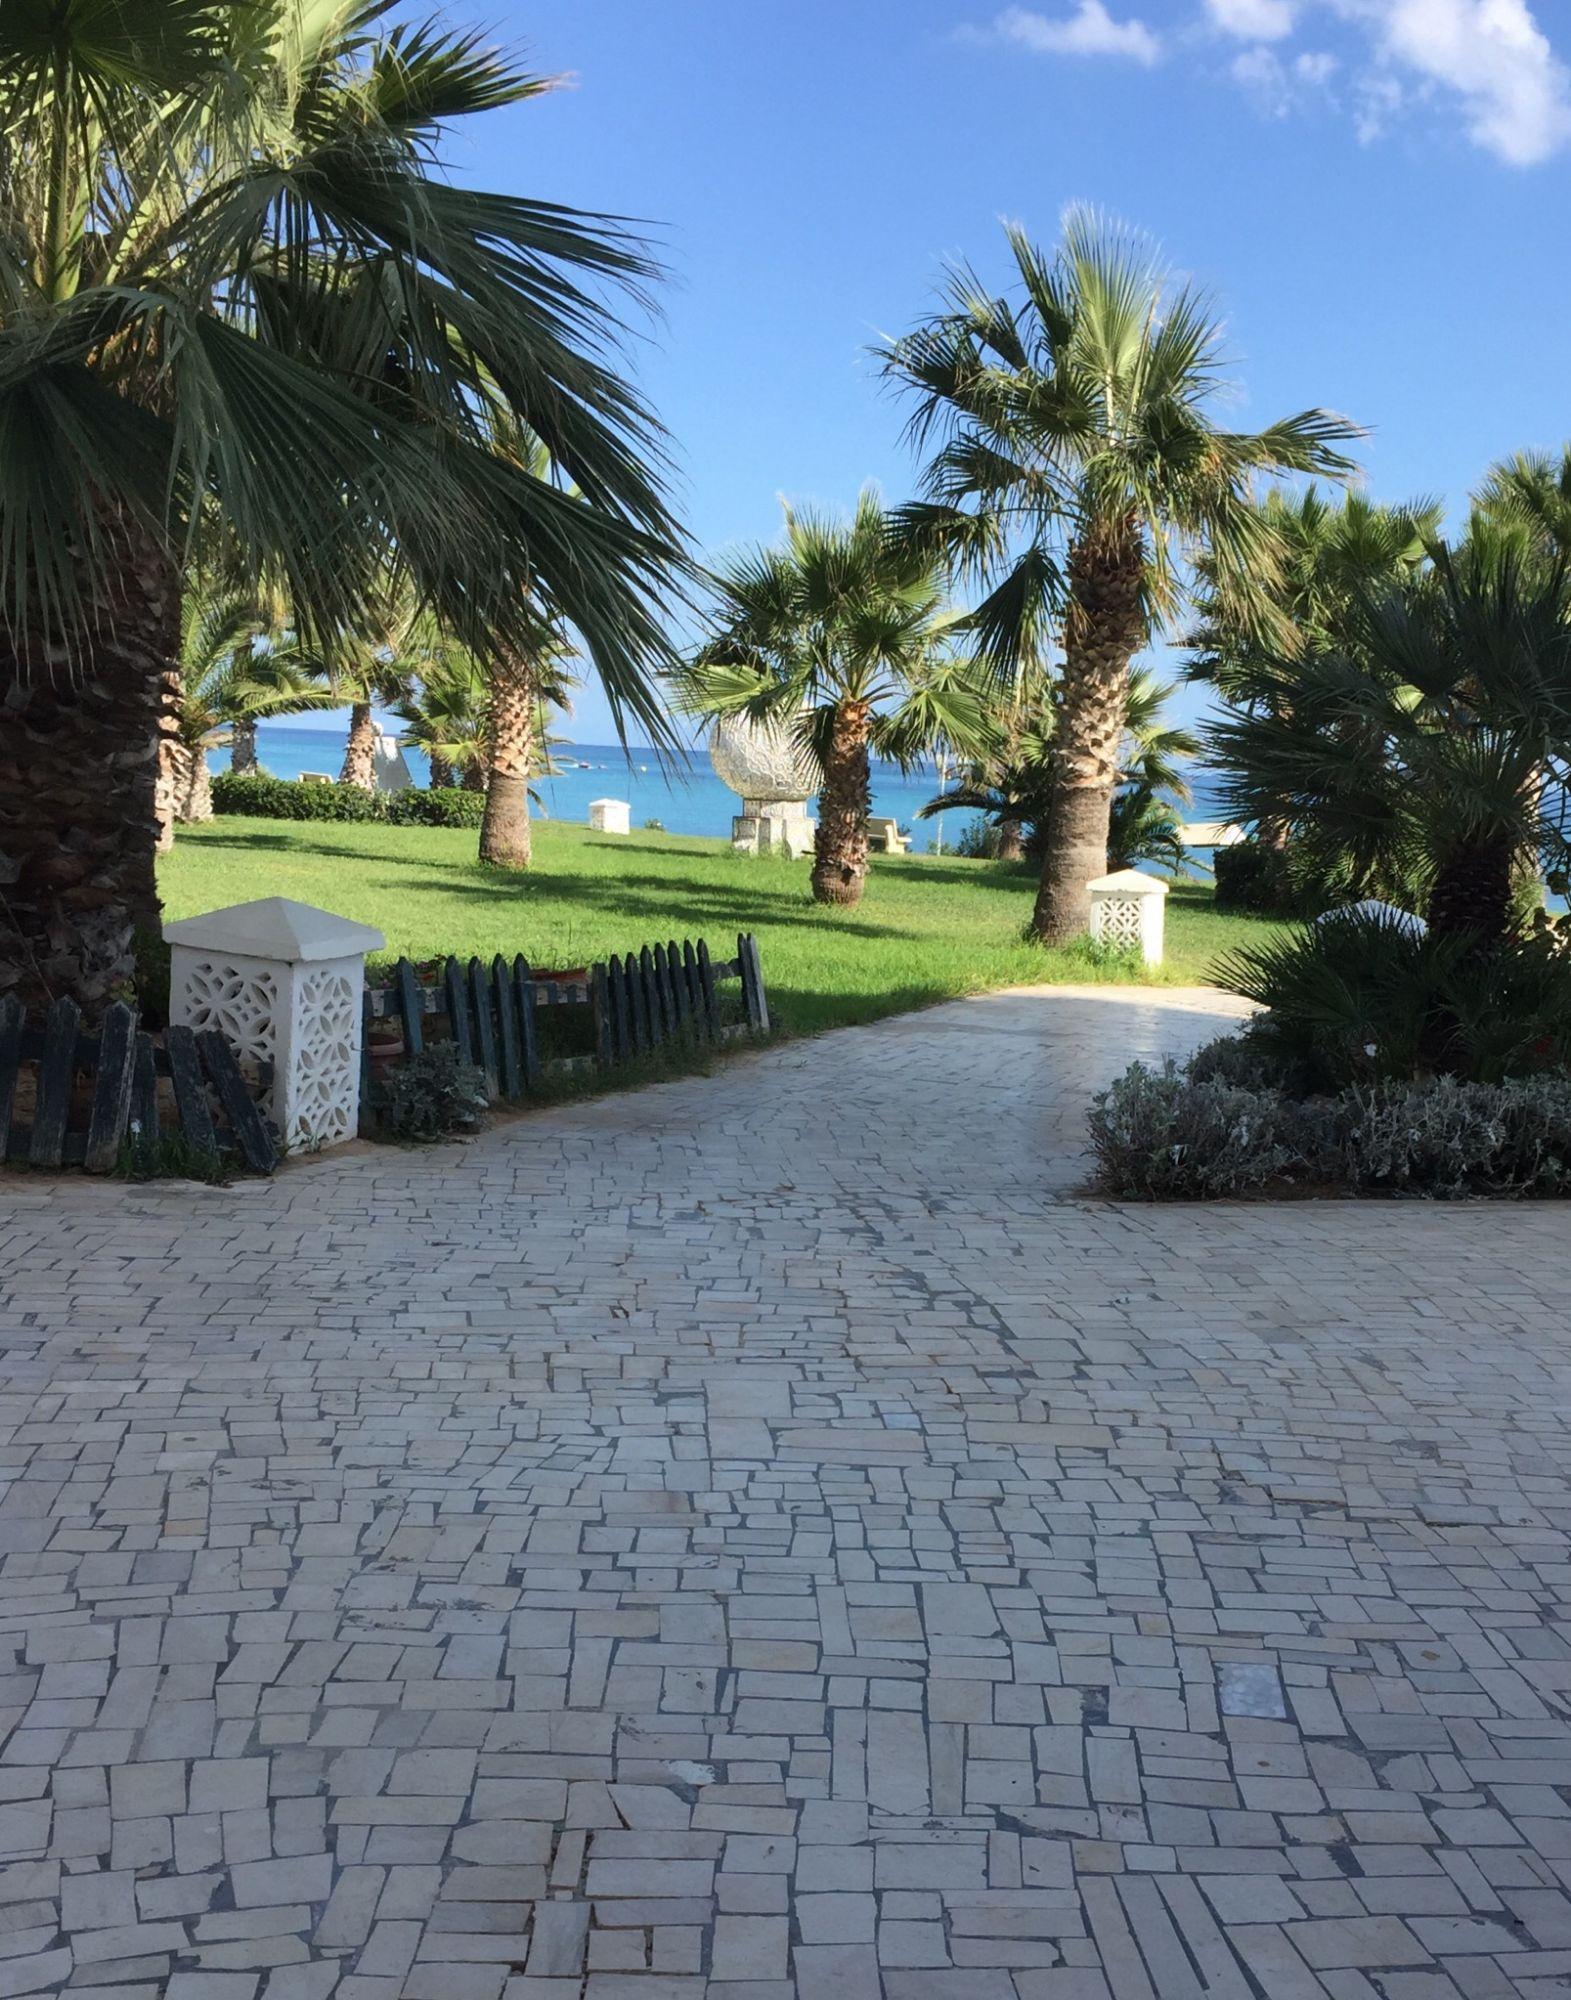 Jardin sur la plage